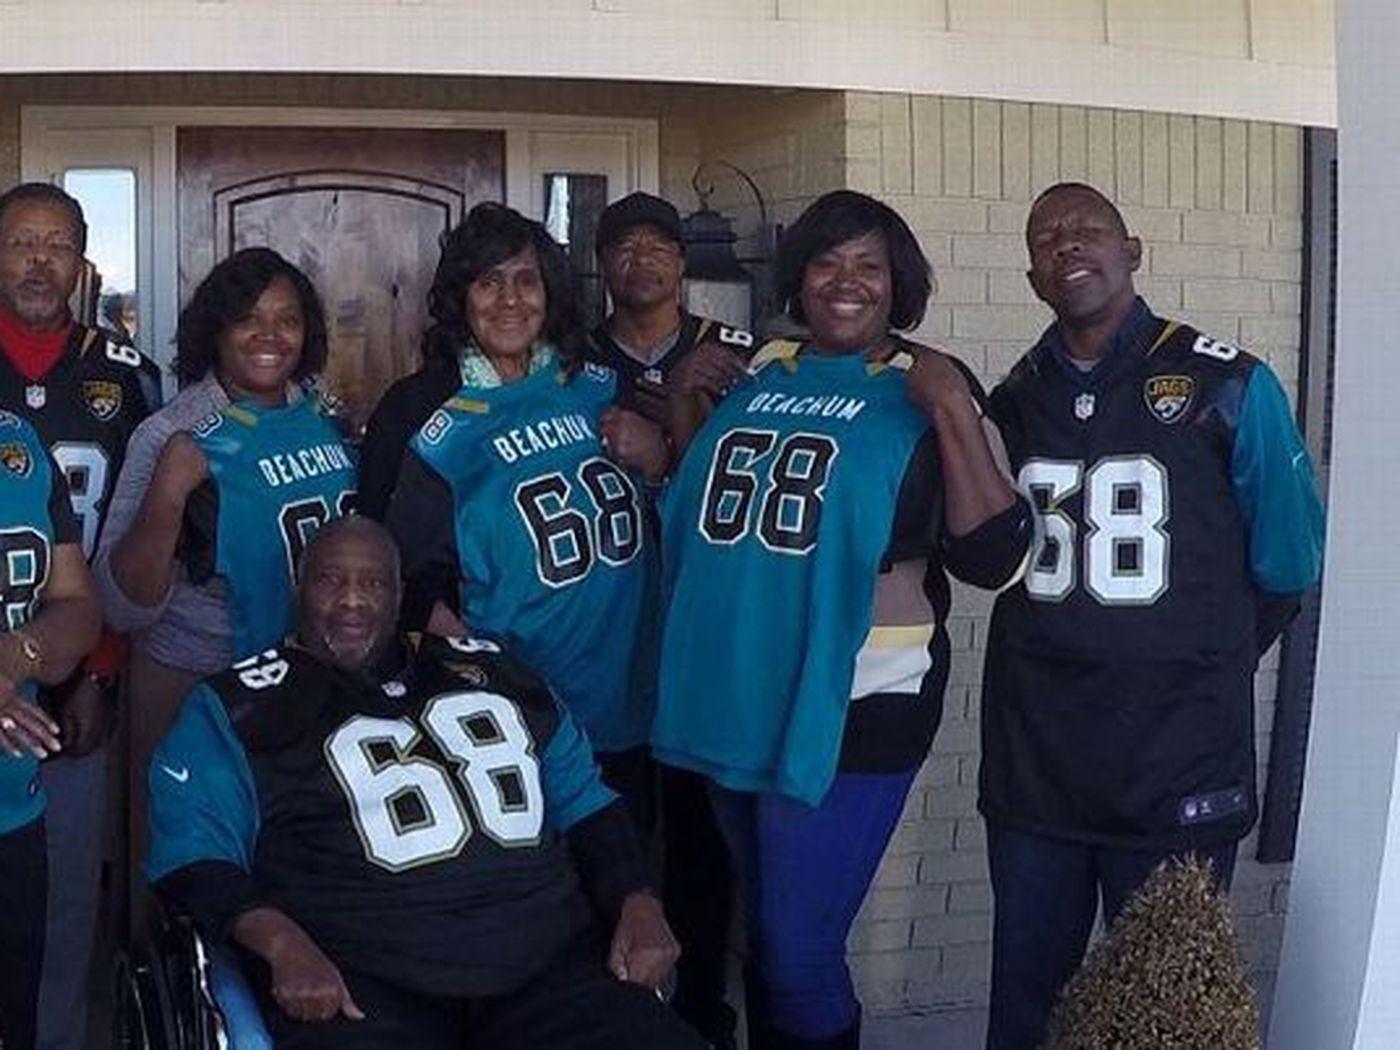 superior quality 25f66 94b87 Jacksonville Jaguars Daily: Kelvin Beachum helps parents on ...